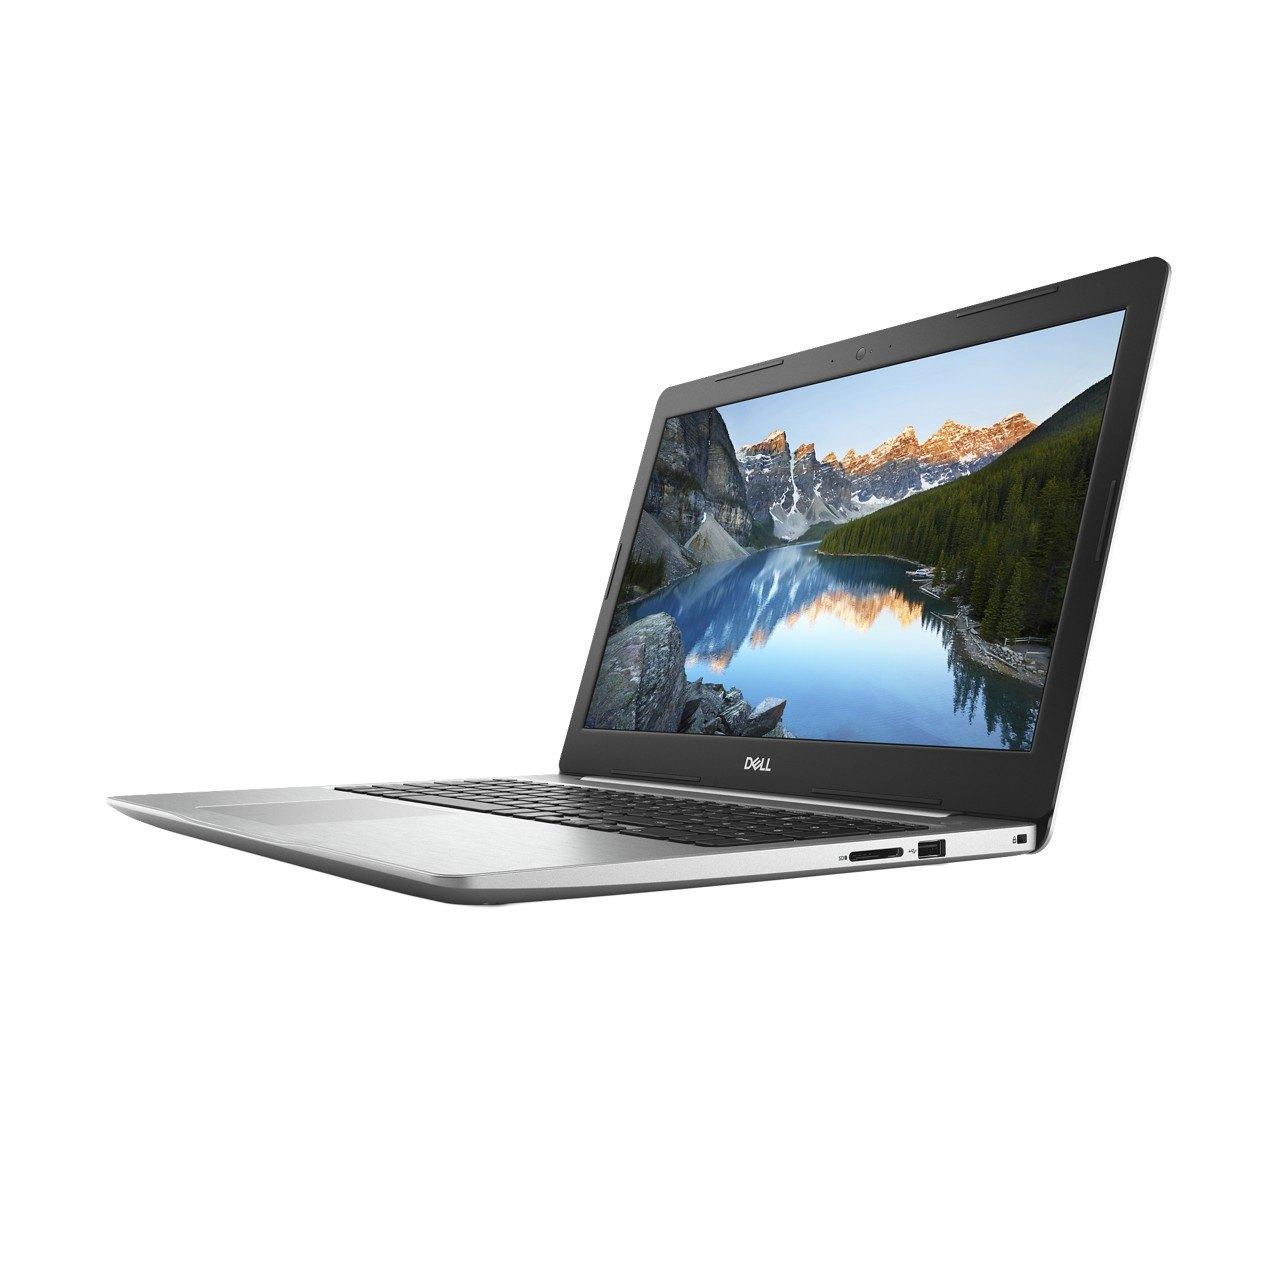 Dell Inspiron 15 5000- i7-7500U - 256GB SSD- 8GB Memory : $499.99 AC + FS